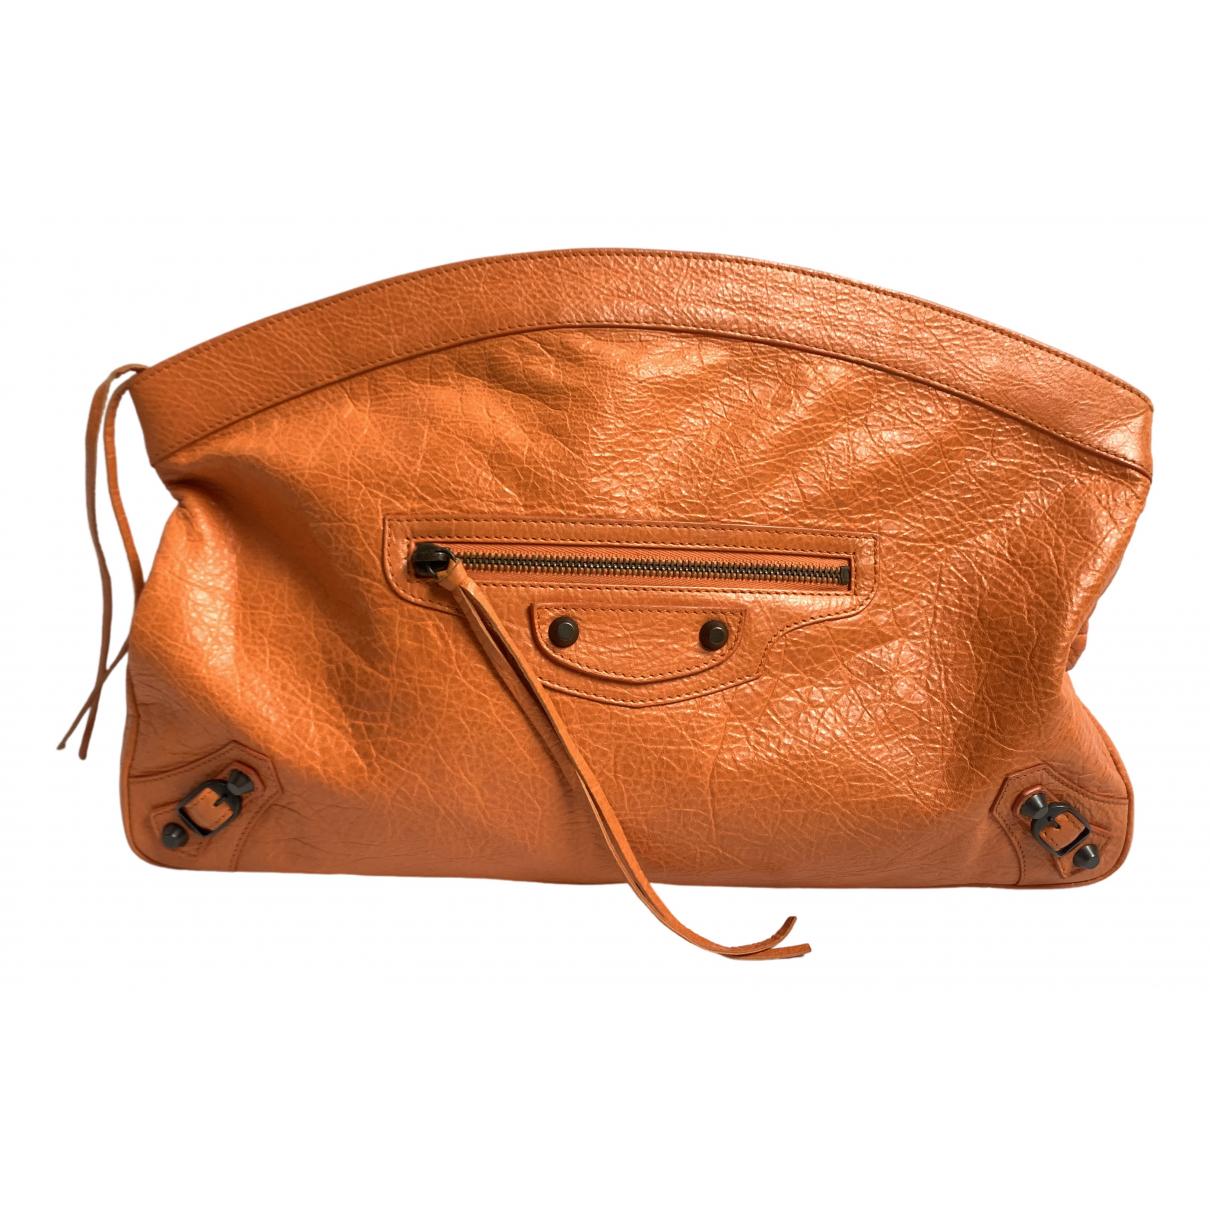 Balenciaga - Pochette   pour femme en cuir - orange